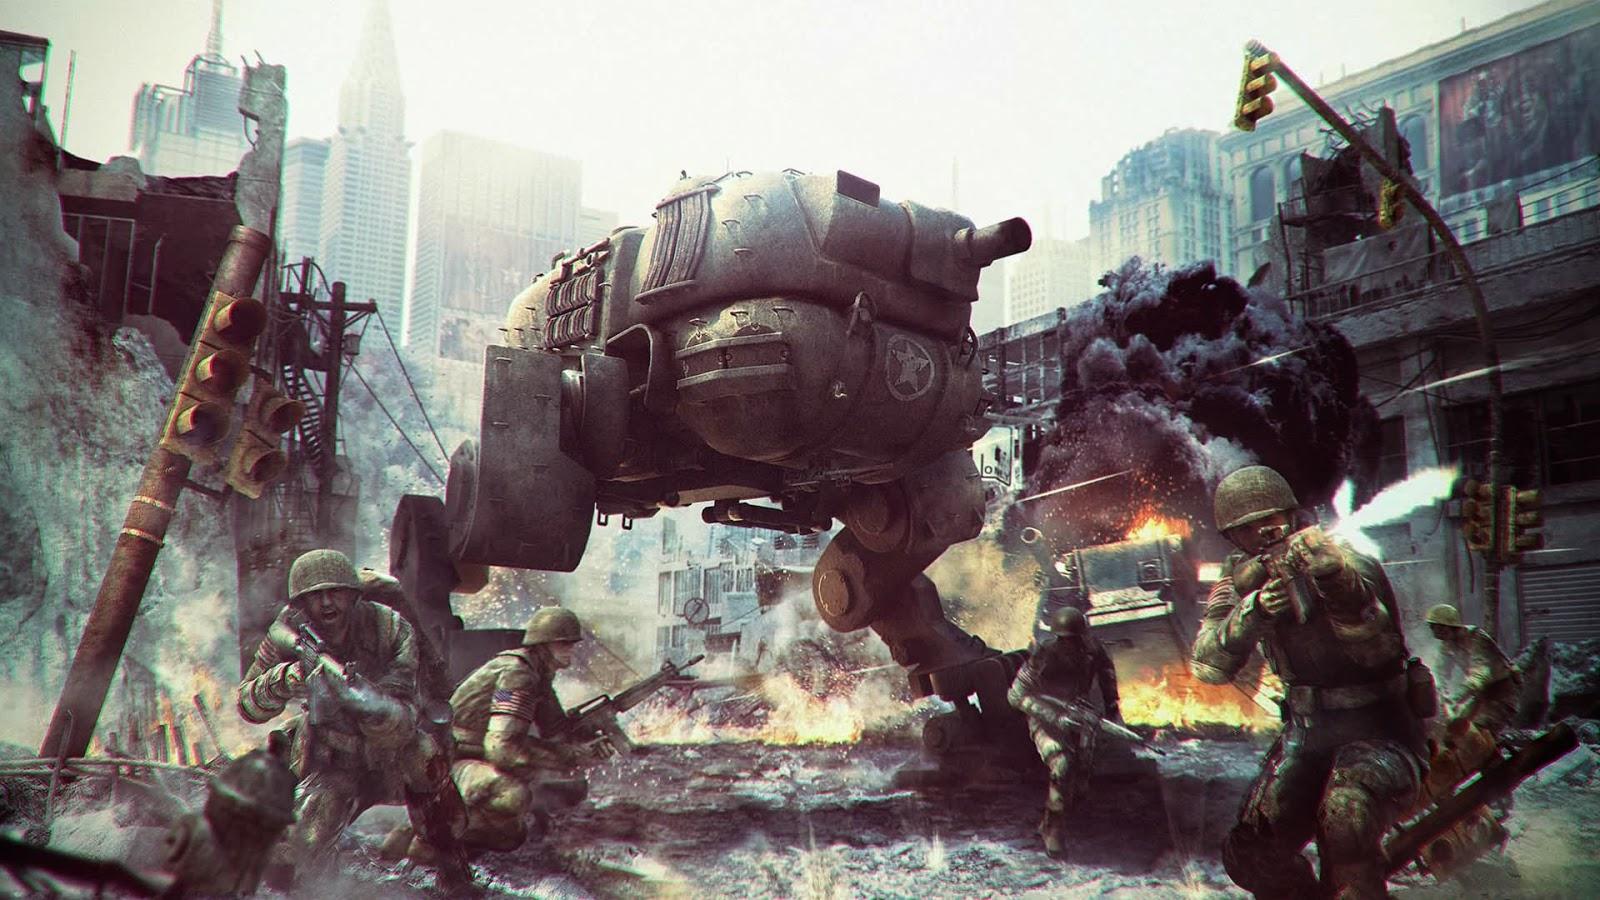 papel de parede para pc de jogos de guerra